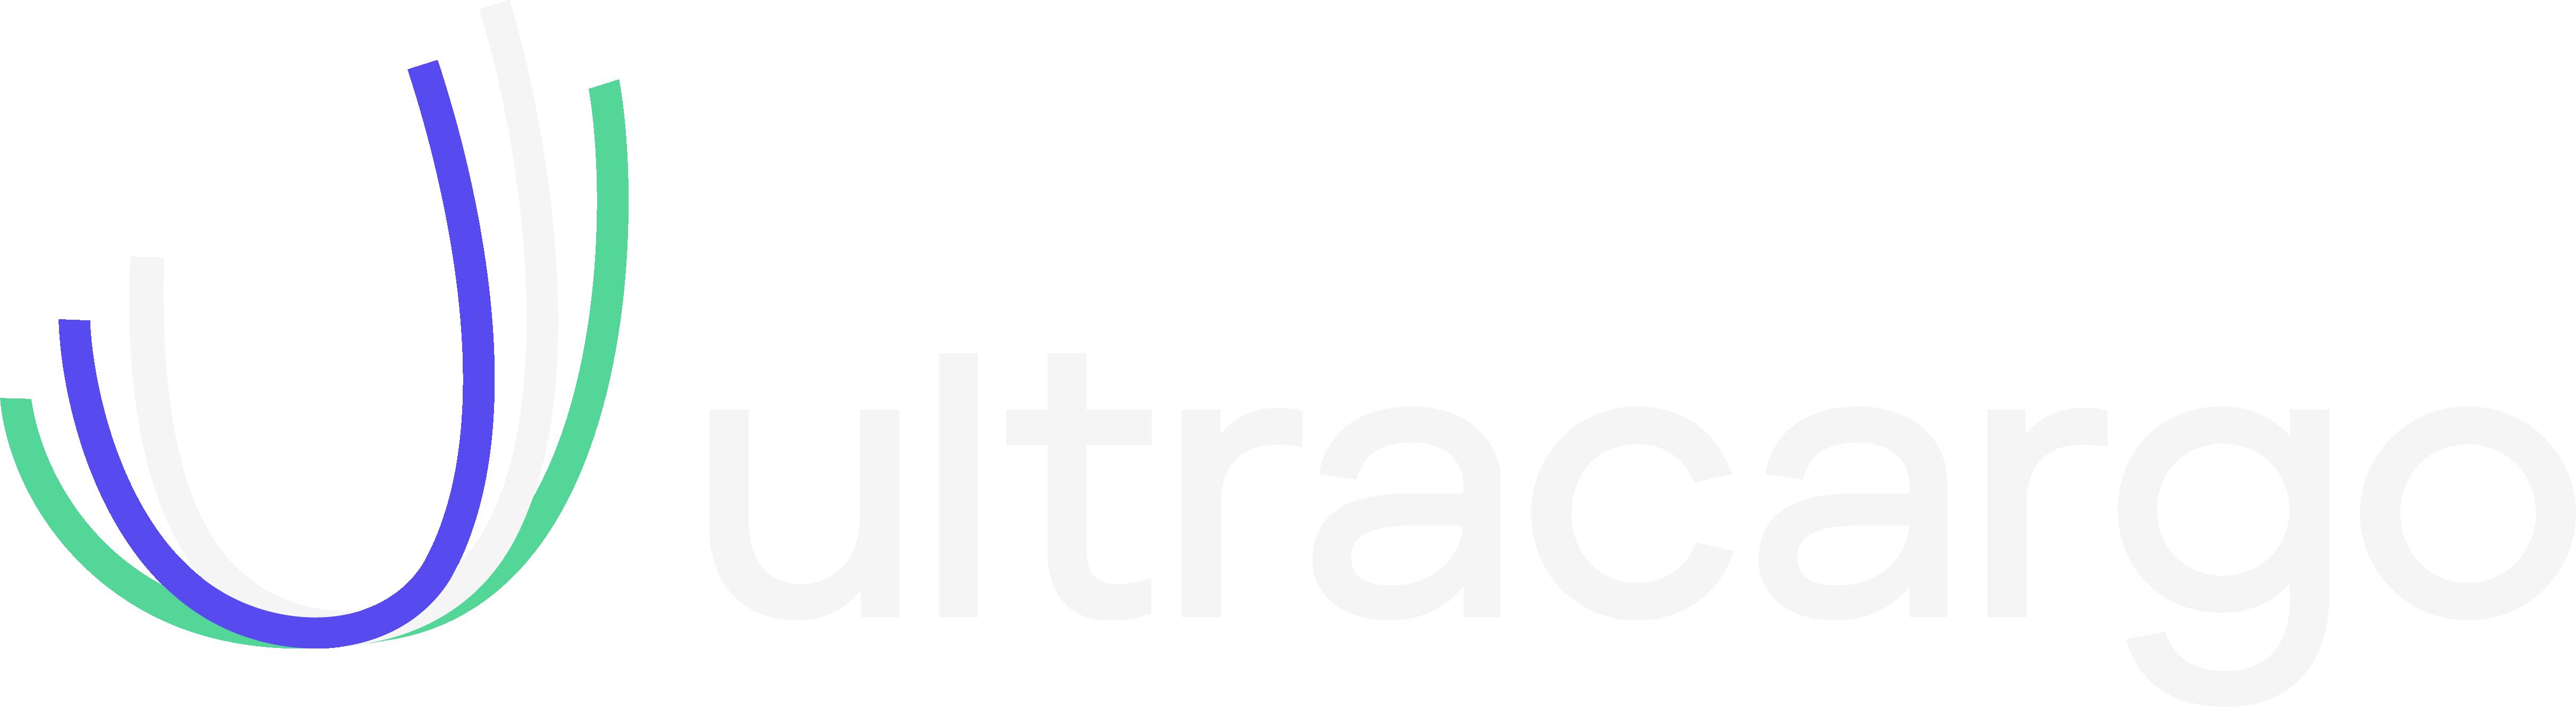 Ultracargo